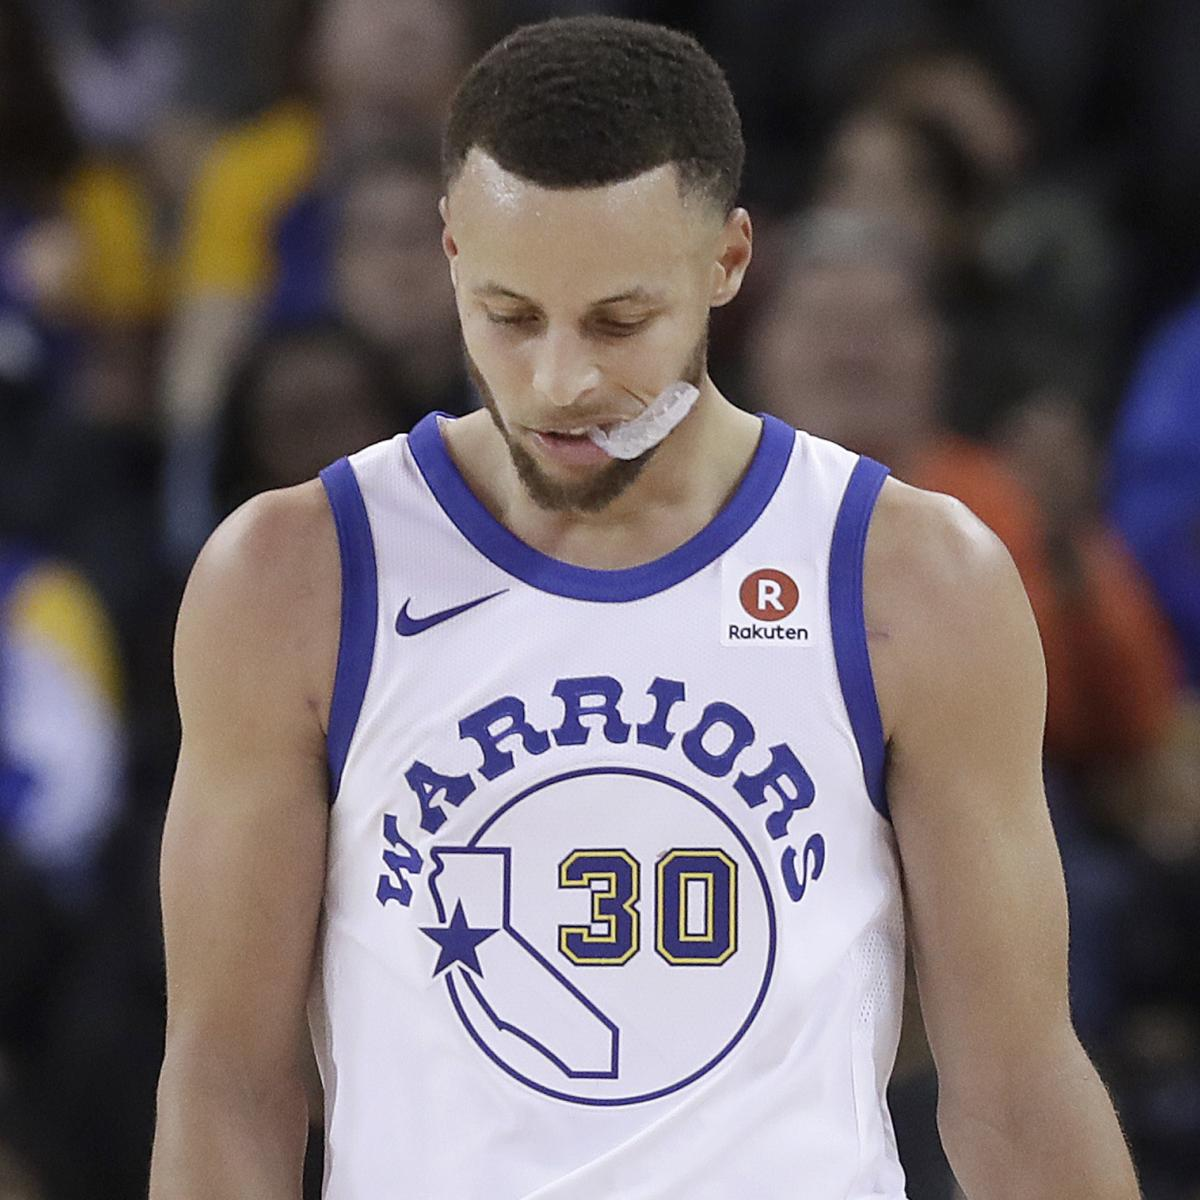 Stephen Curry Knee Injury to Be Re-Evaluated in 1 Week